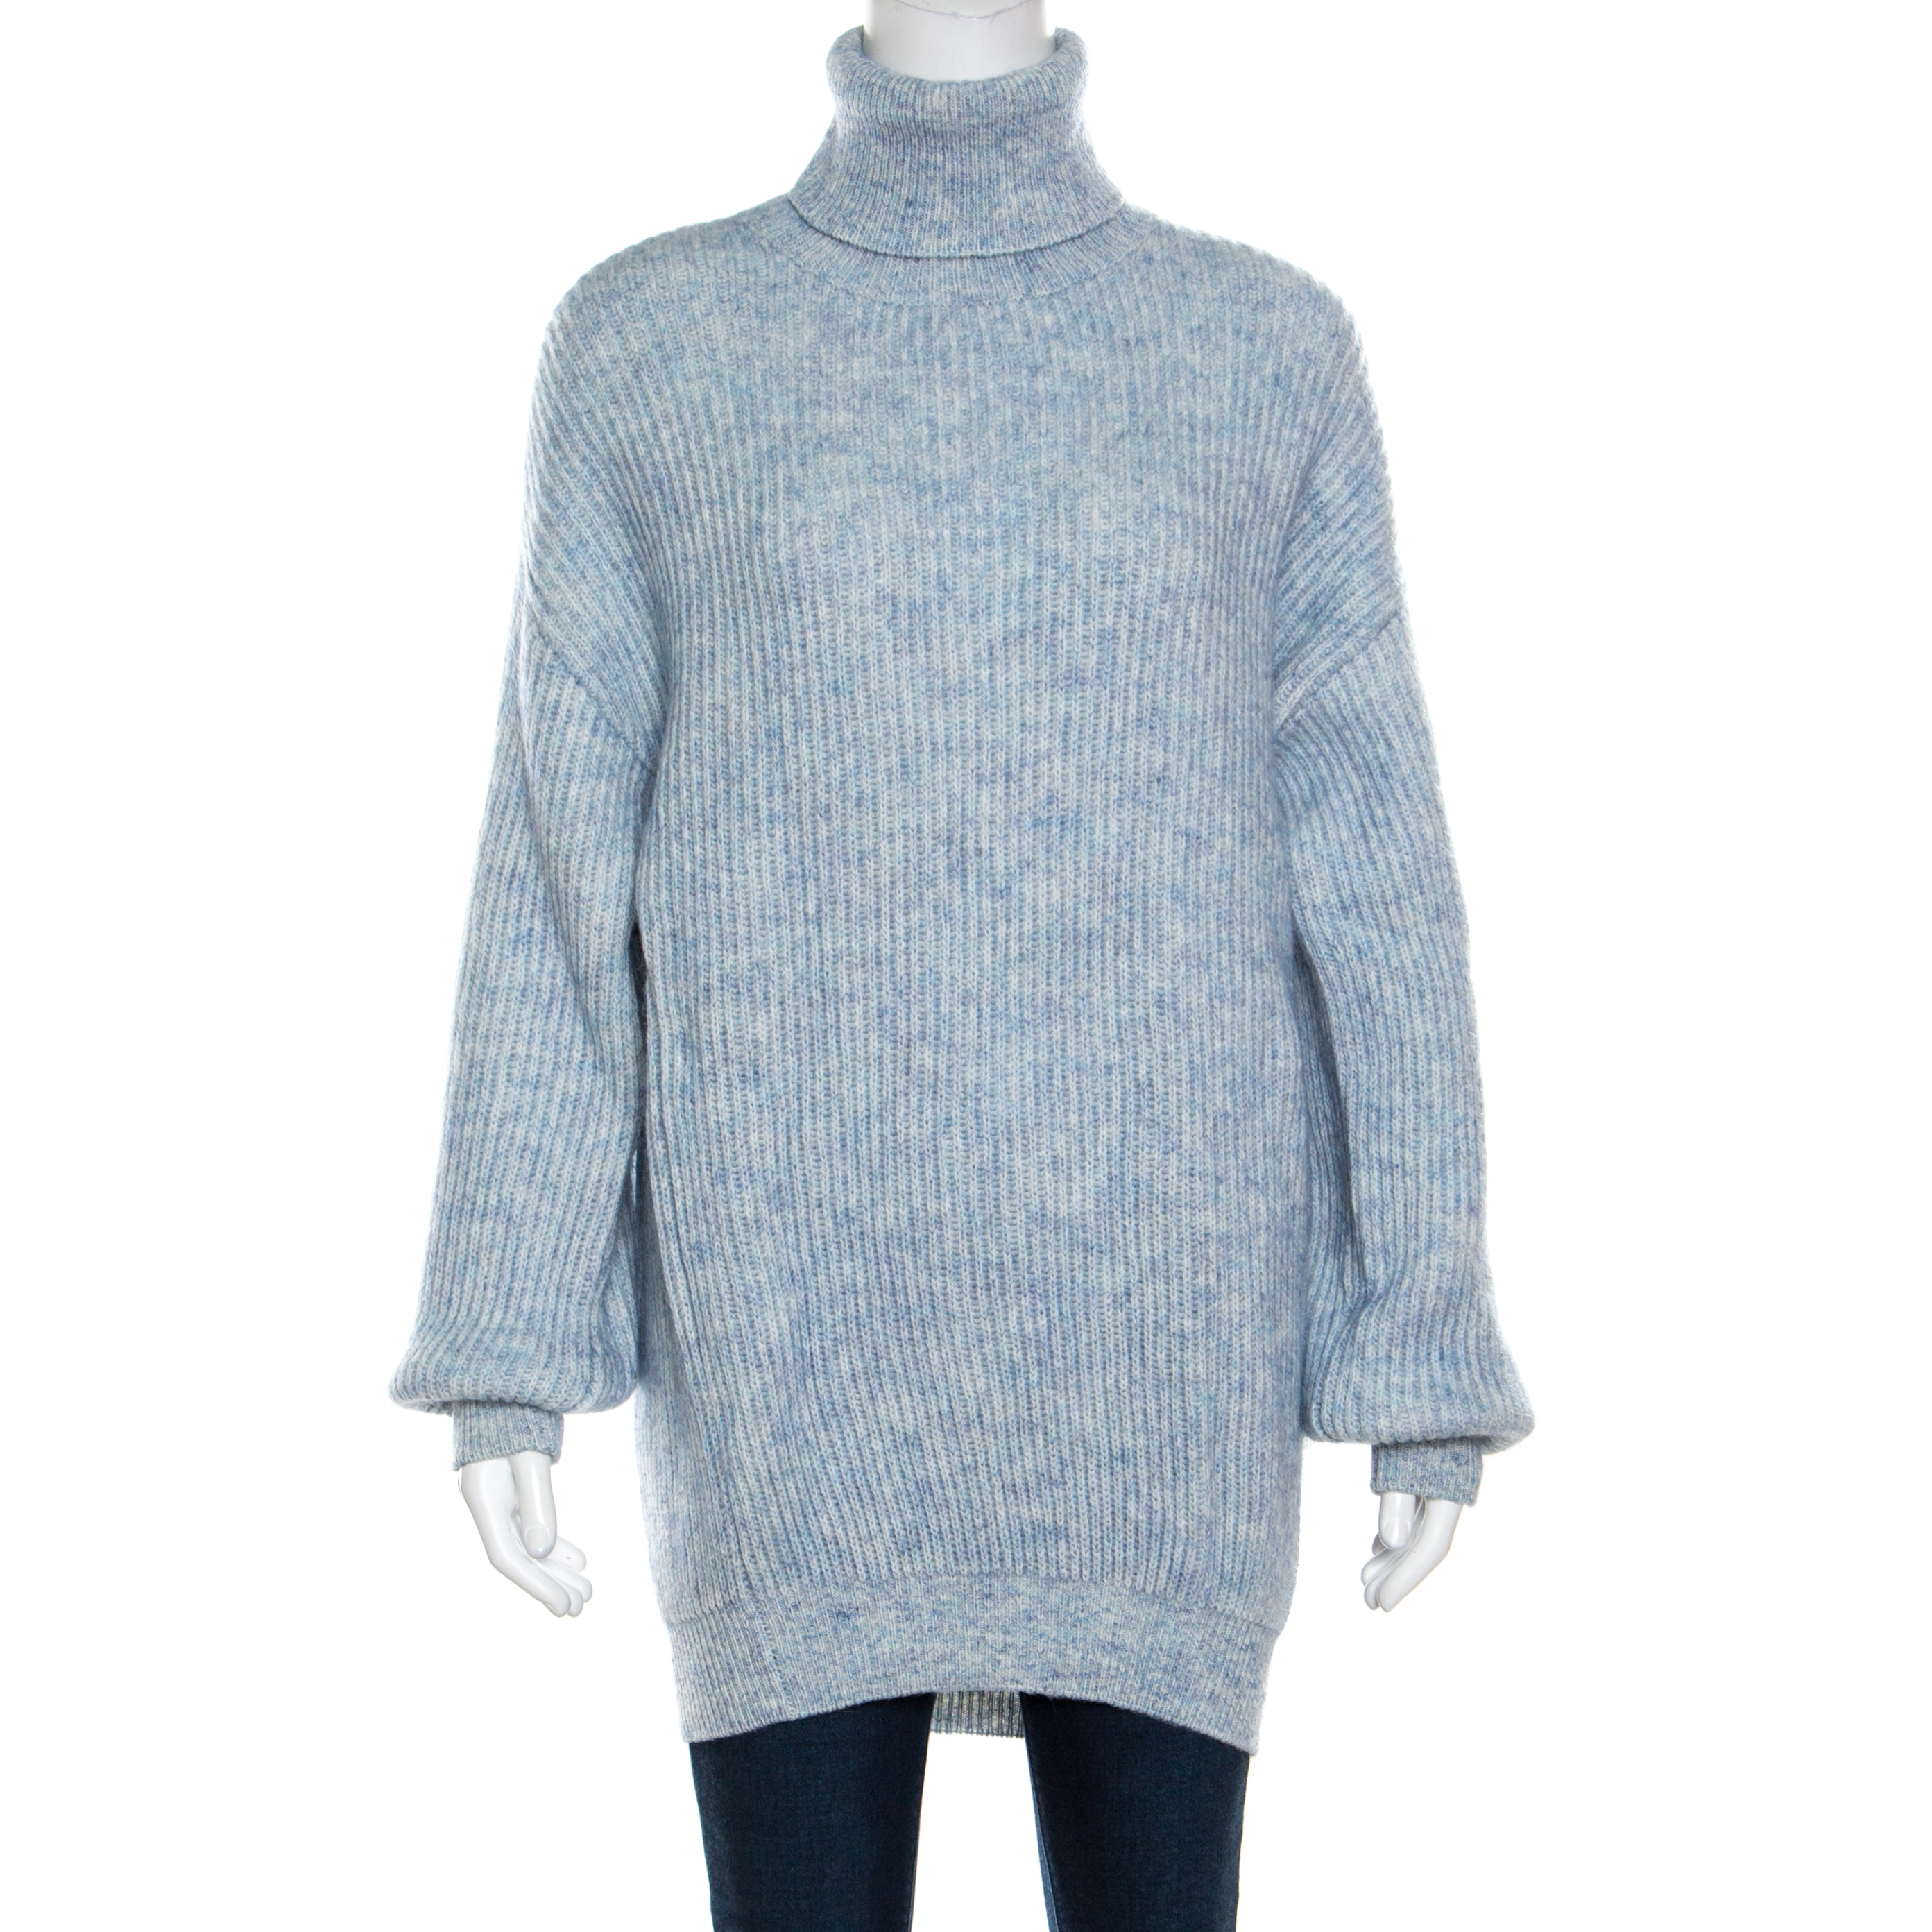 a210d925365 ... Stella McCartney Mottled Blue Wool and Mohair Blend Rib Knit Turtleneck  Sweater L. nextprev. prevnext